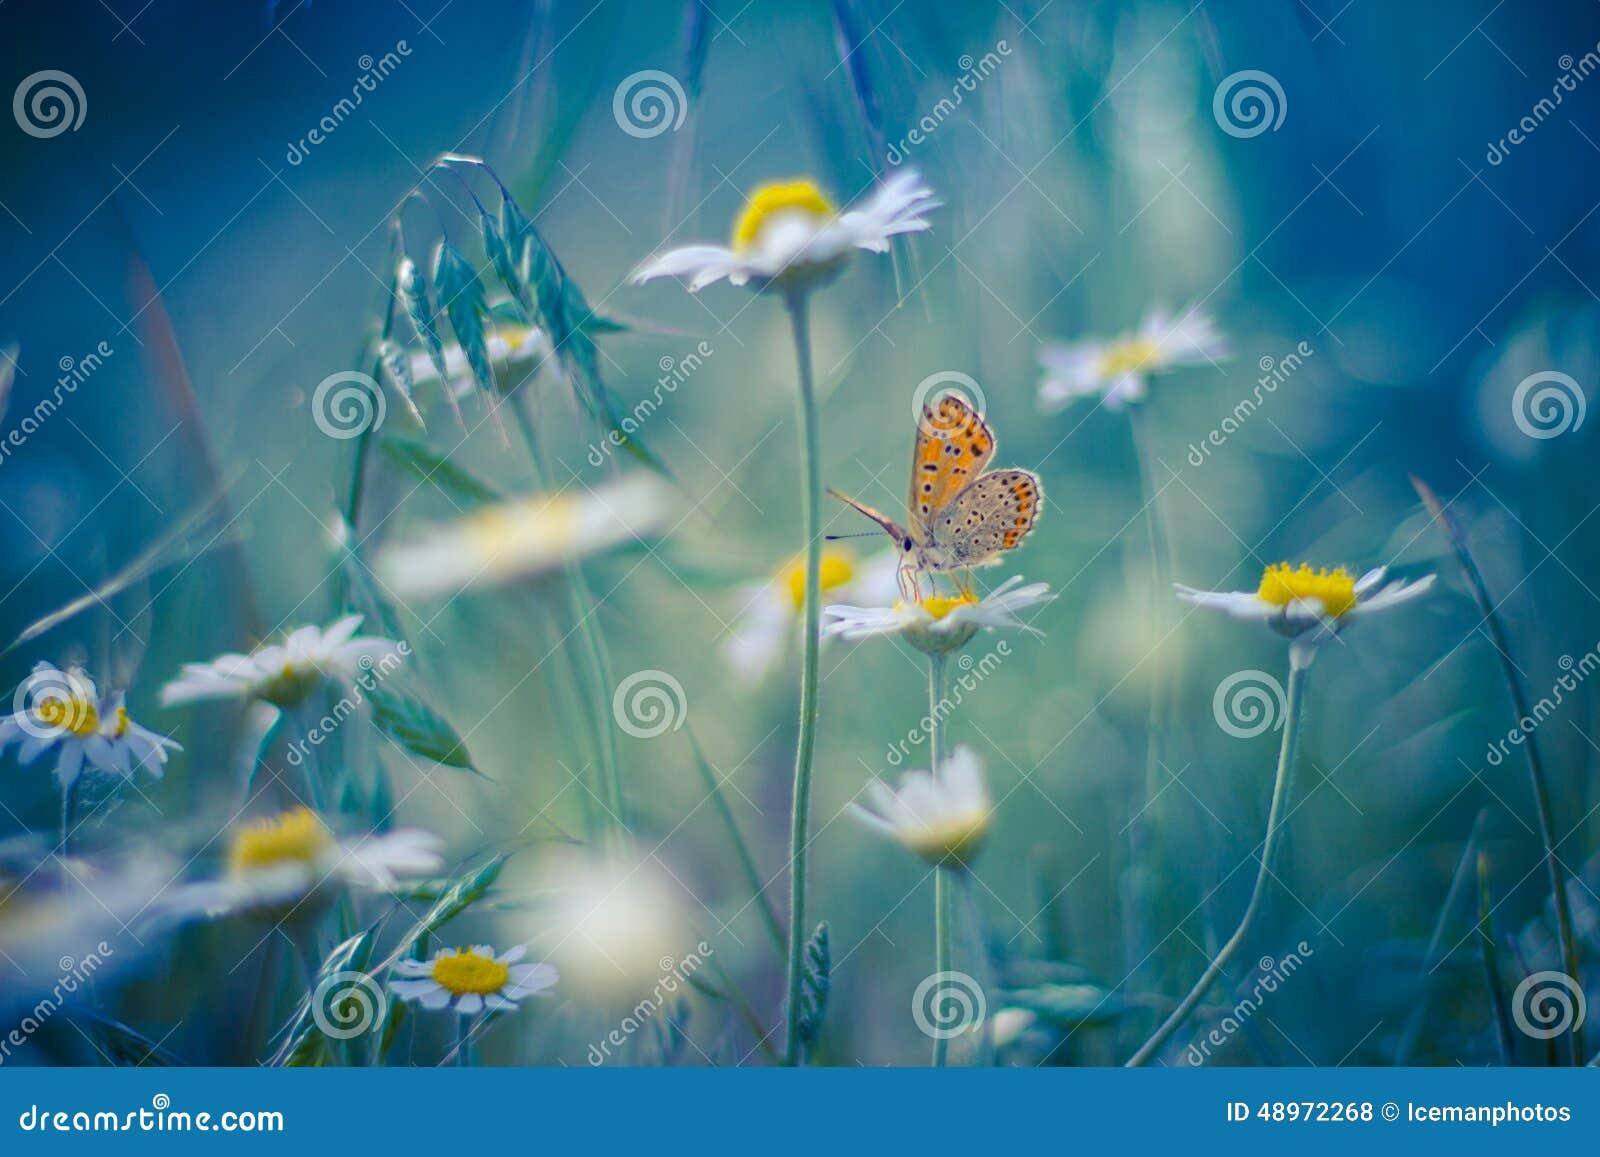 Golden Butterfly on daisy flowers